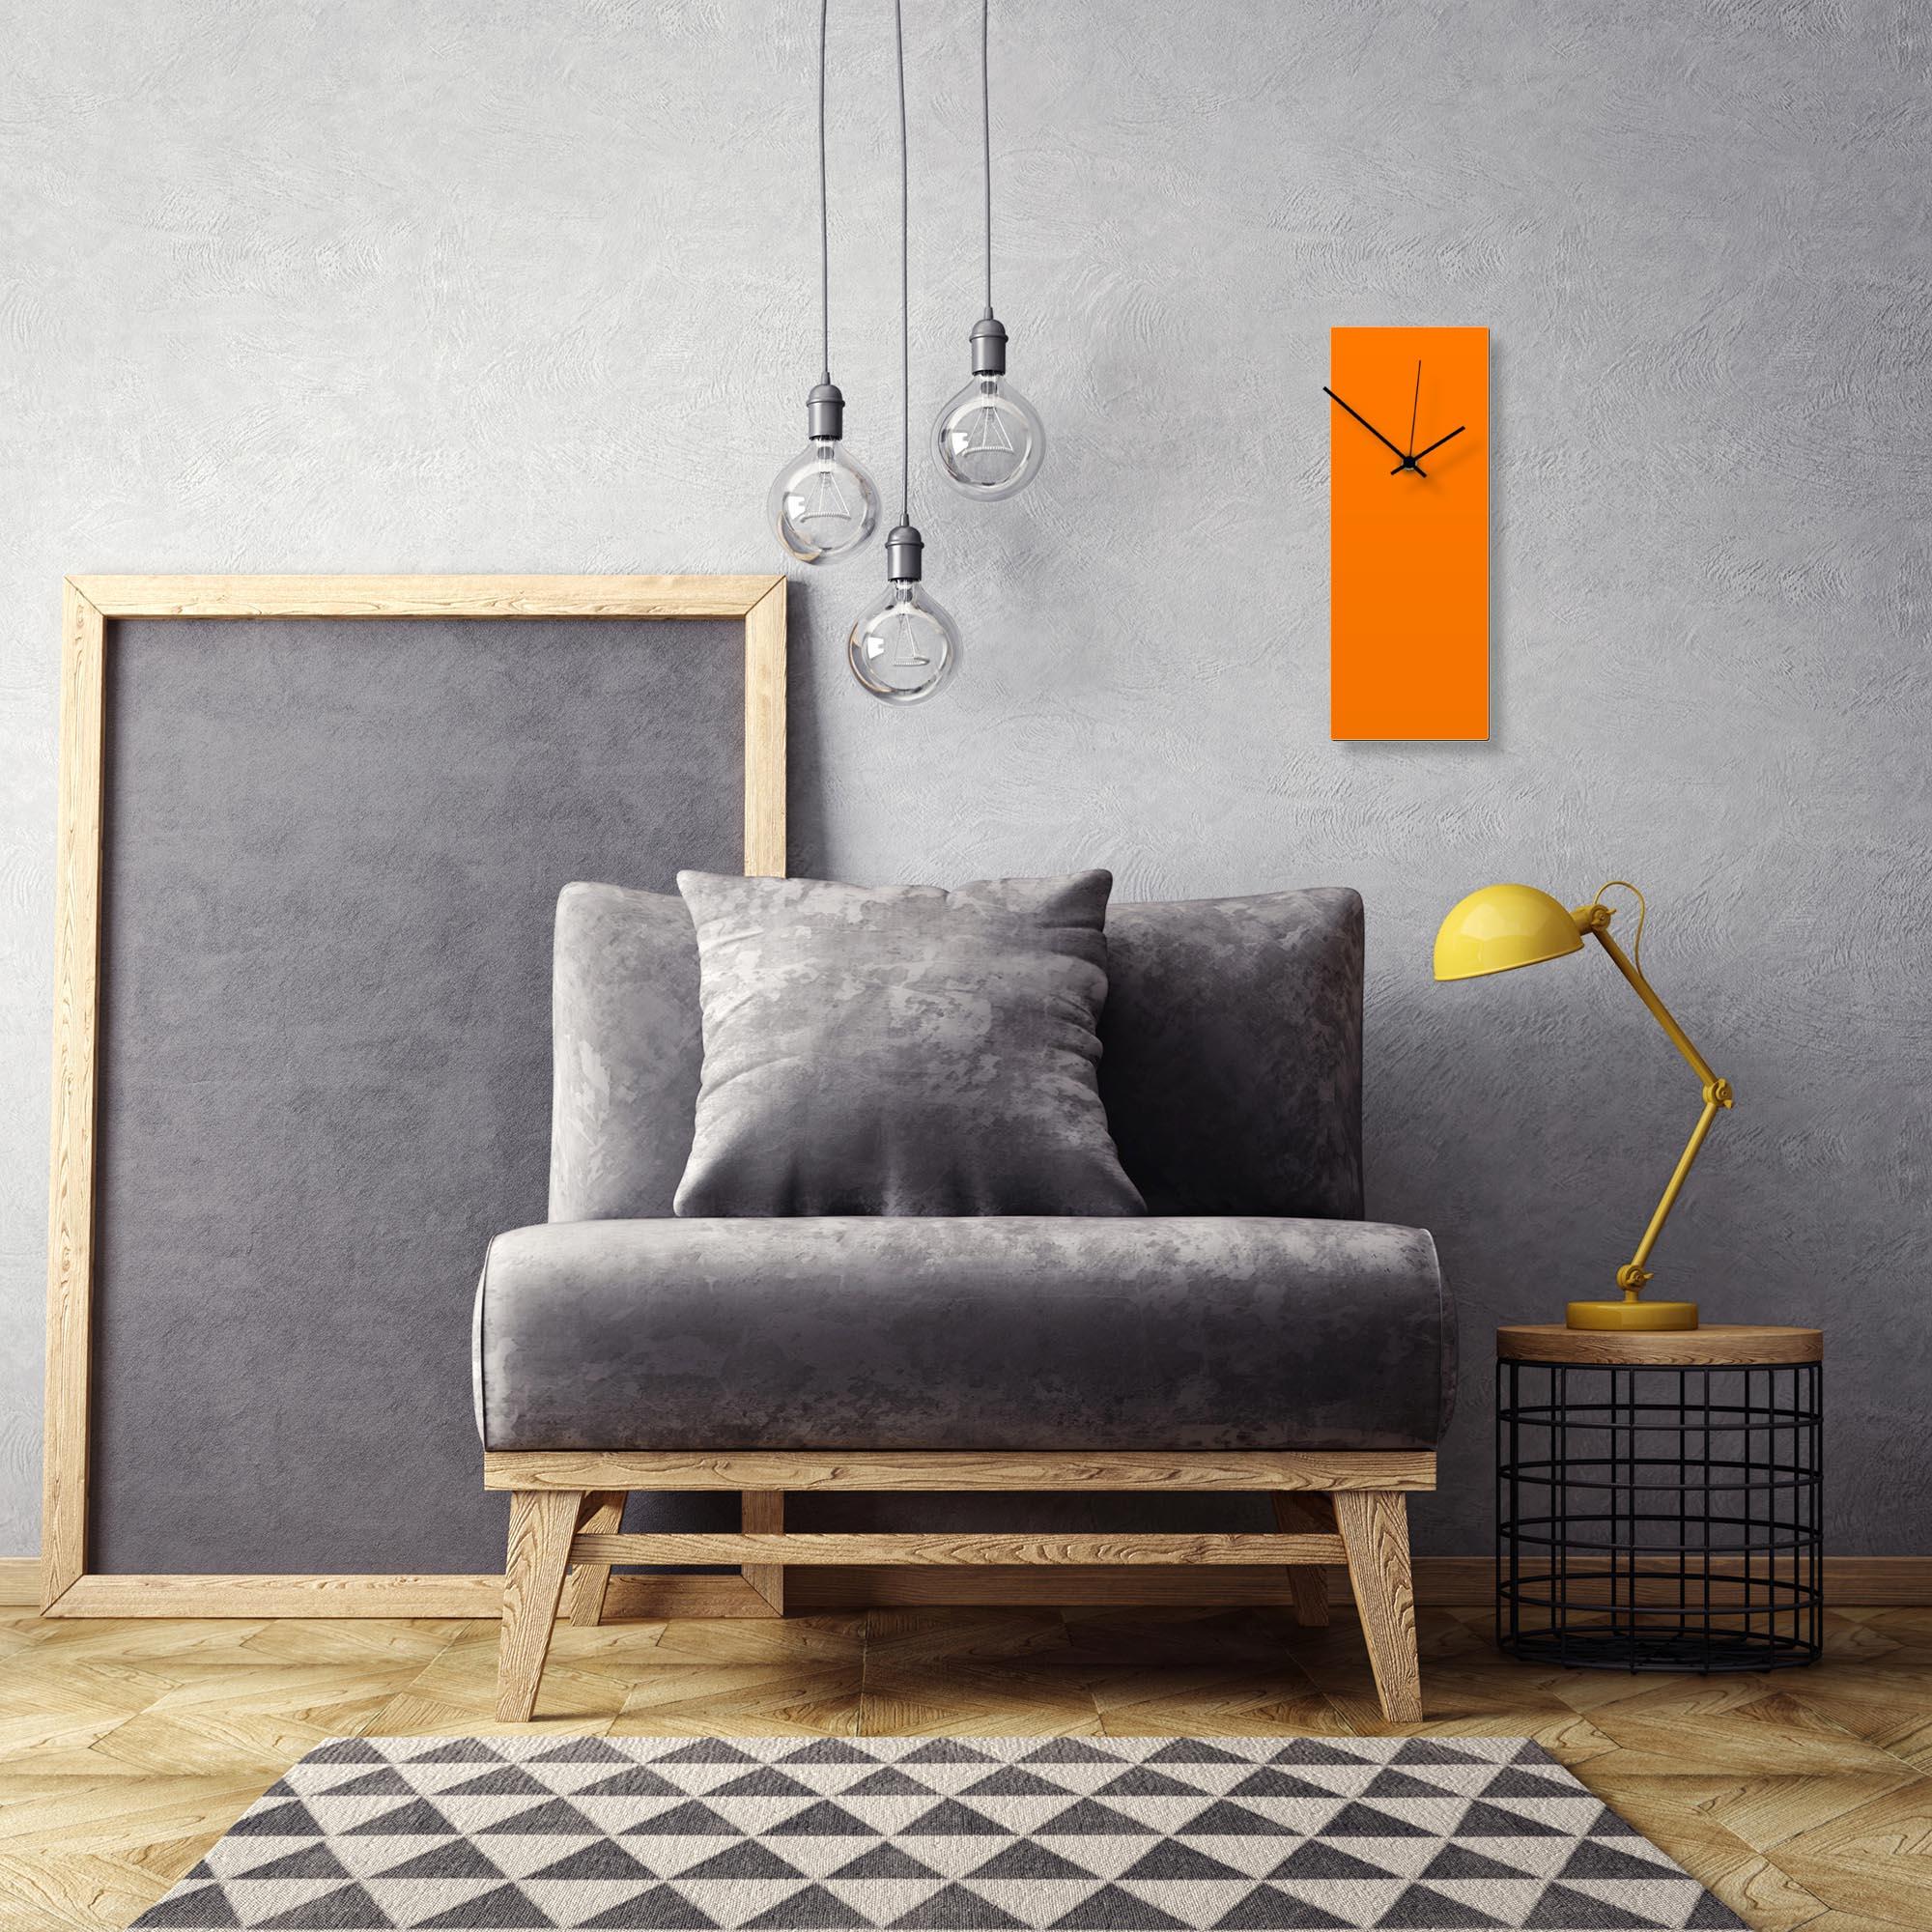 Orangeout Black Clock by Adam Schwoeppe Contemporary Clock on Aluminum Polymetal - Alternate View 1